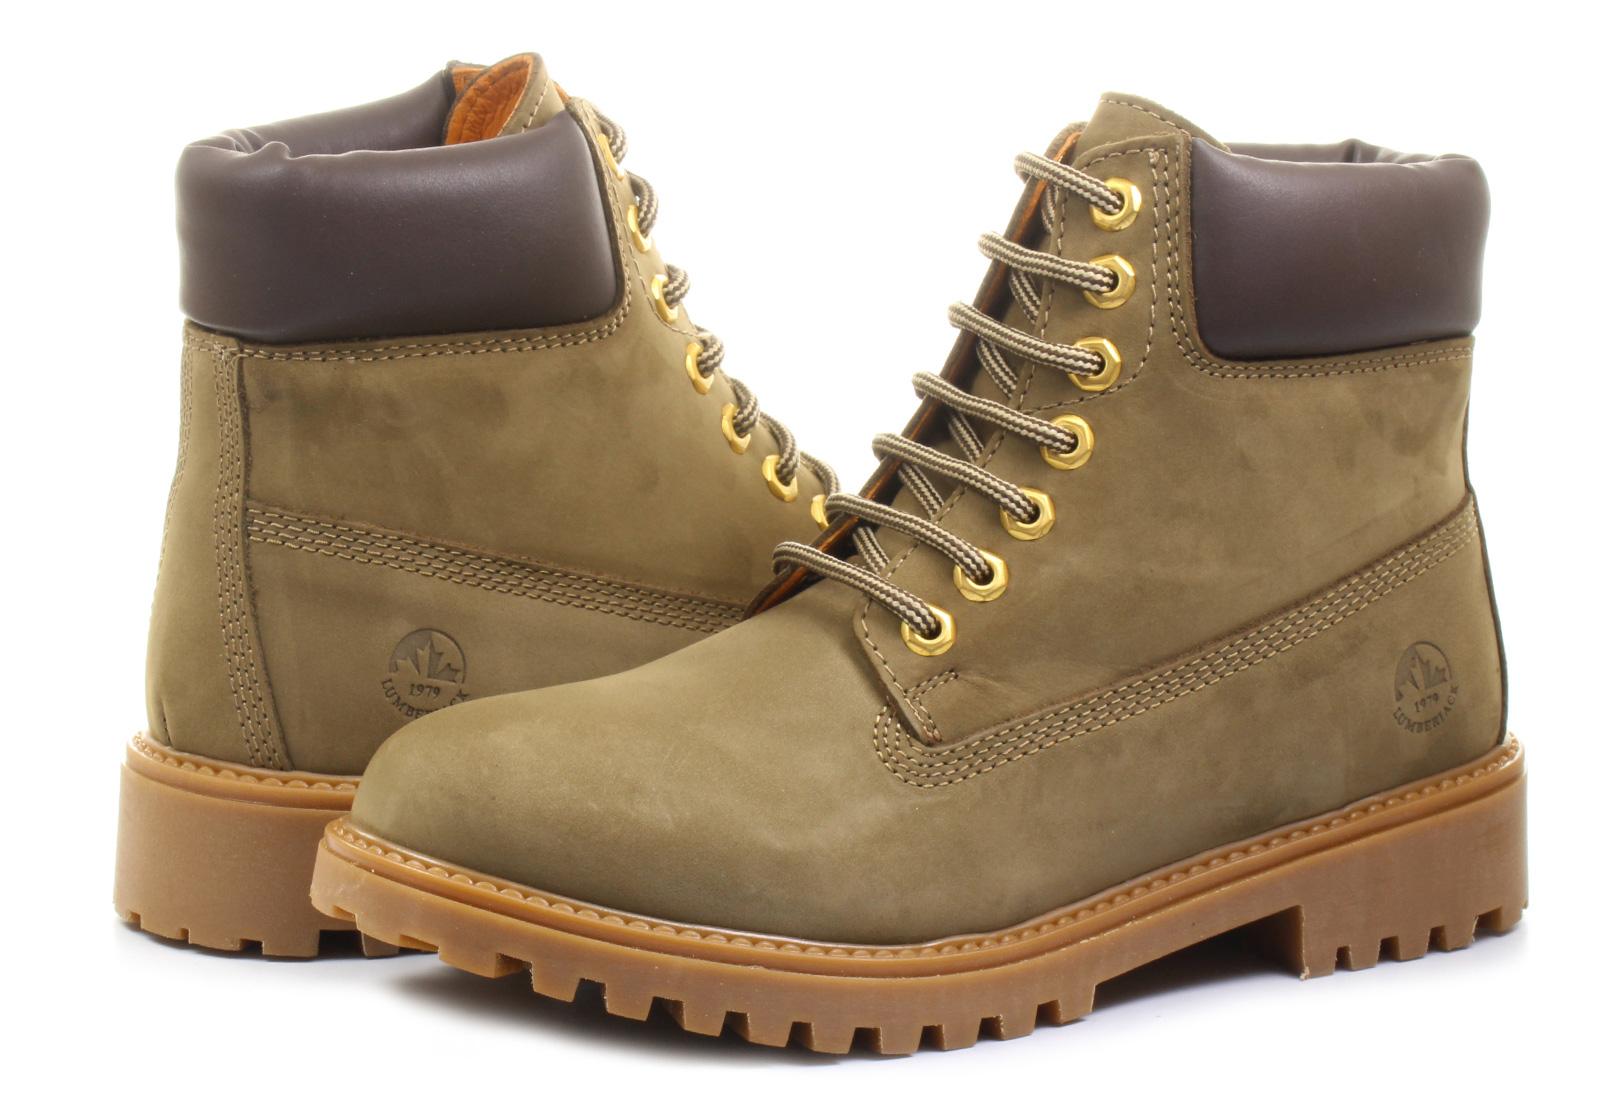 Lumberjack Boots River Vi M01012 D01 Tau Online Shop